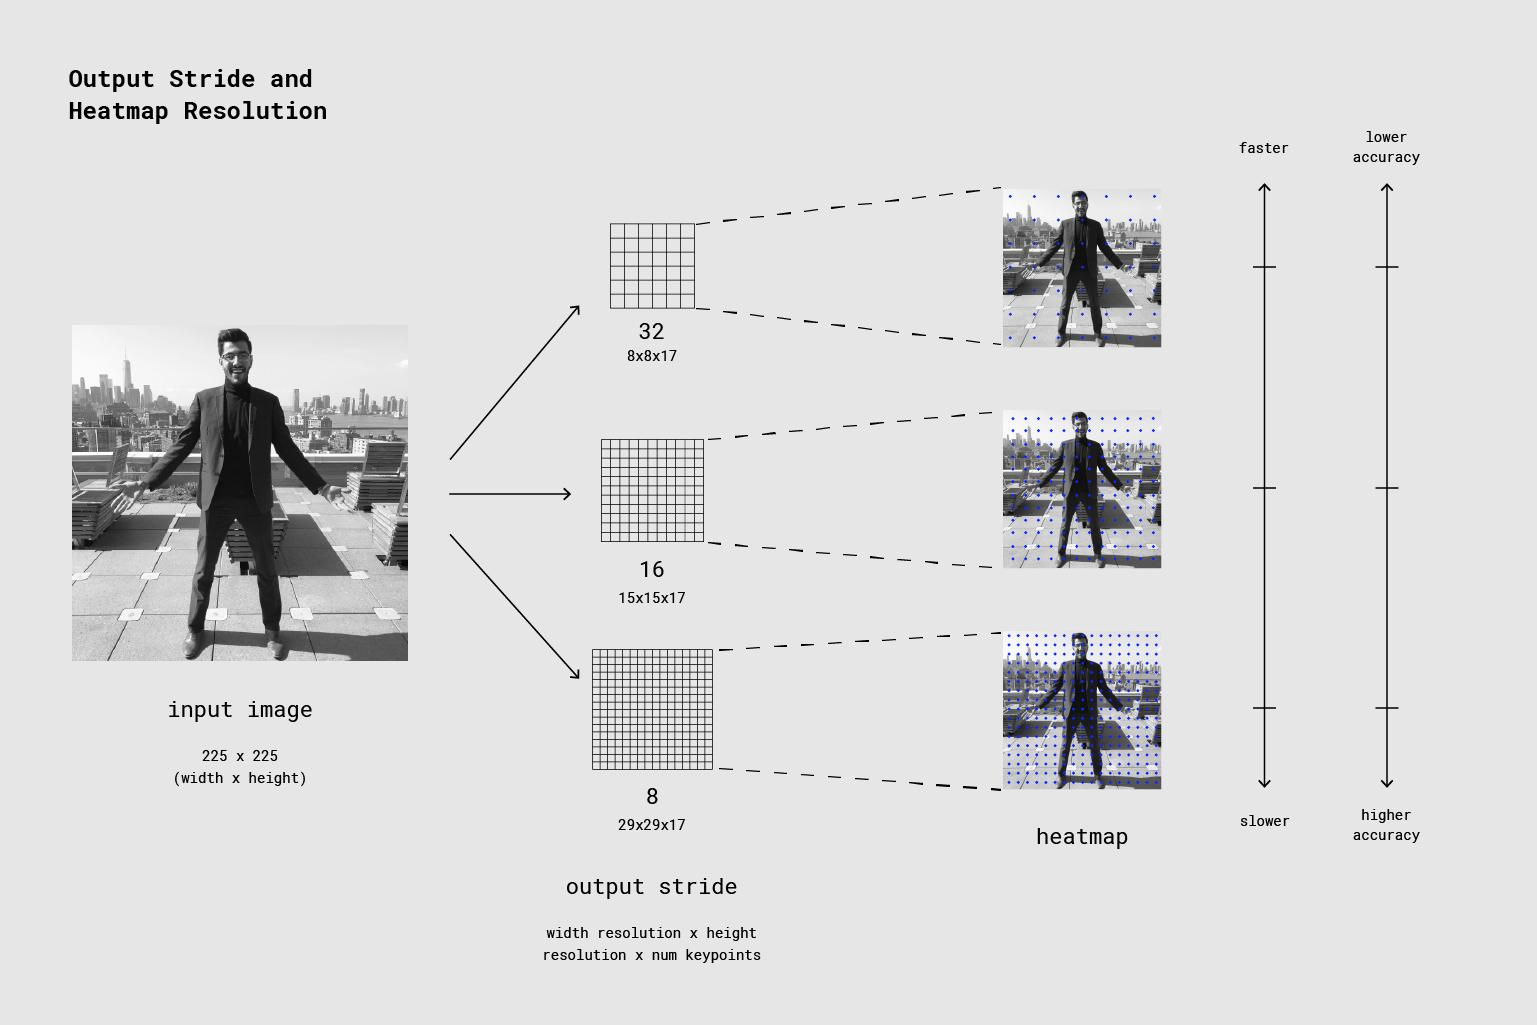 Ausgabeschritt und Heatmap-Auflösung